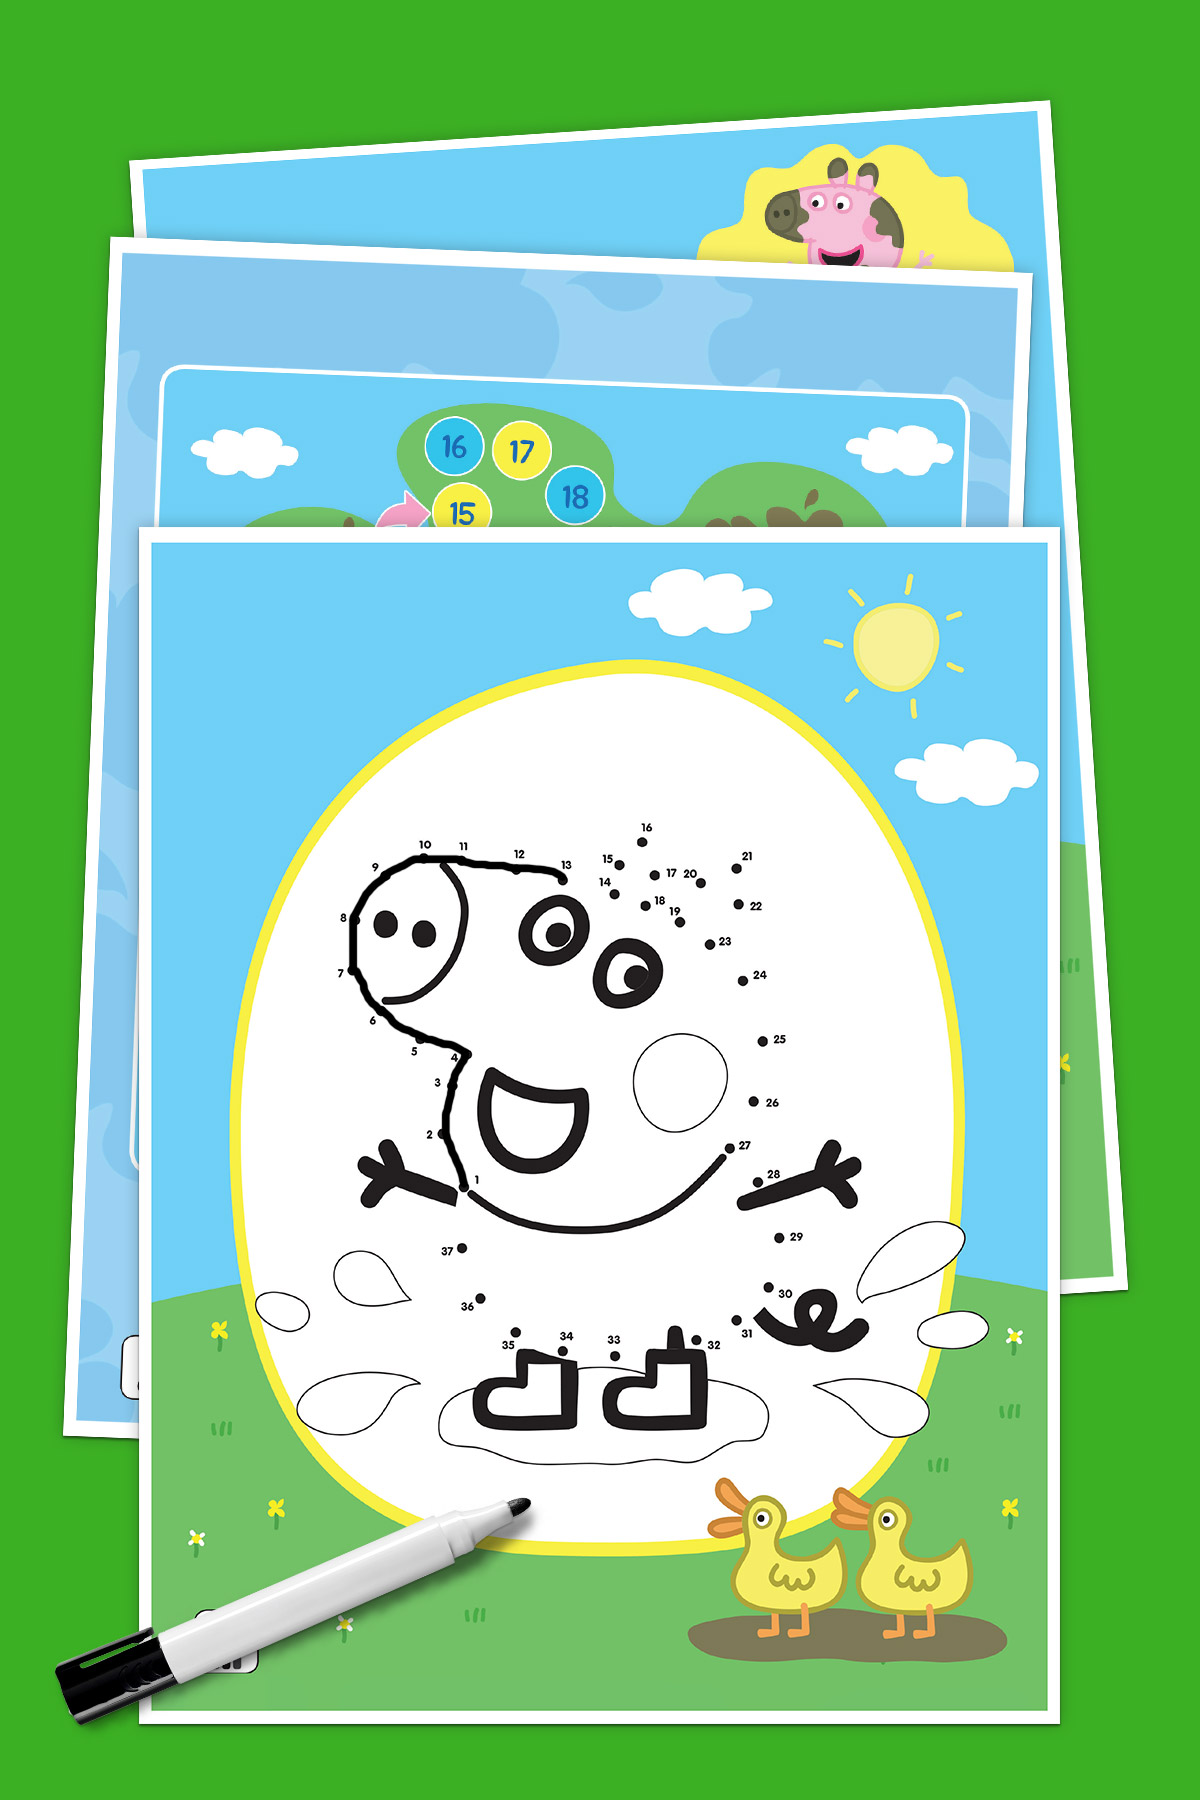 1200x1800 Peppa Pig Rainy Day Activity Pack Nickelodeon Parents